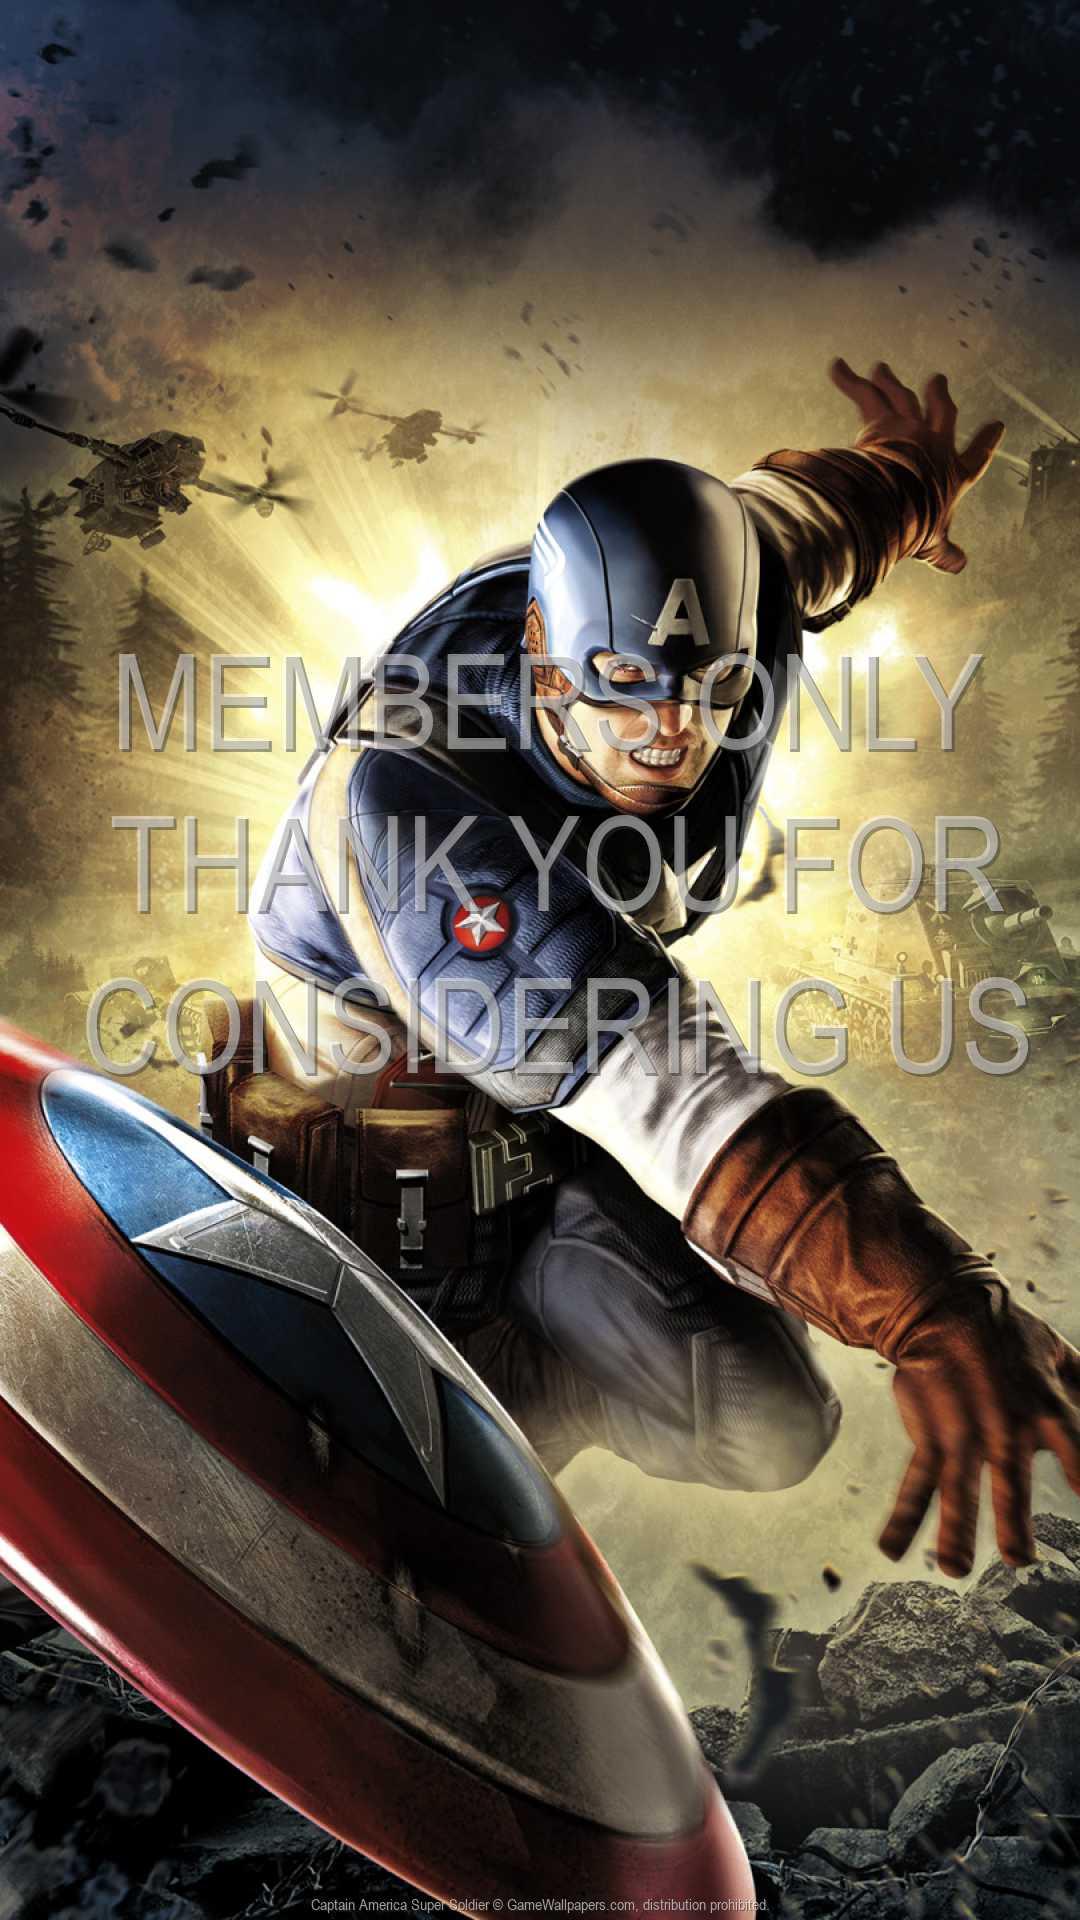 Captain America: Super Soldier 1080p Vertical Handy Hintergrundbild 01